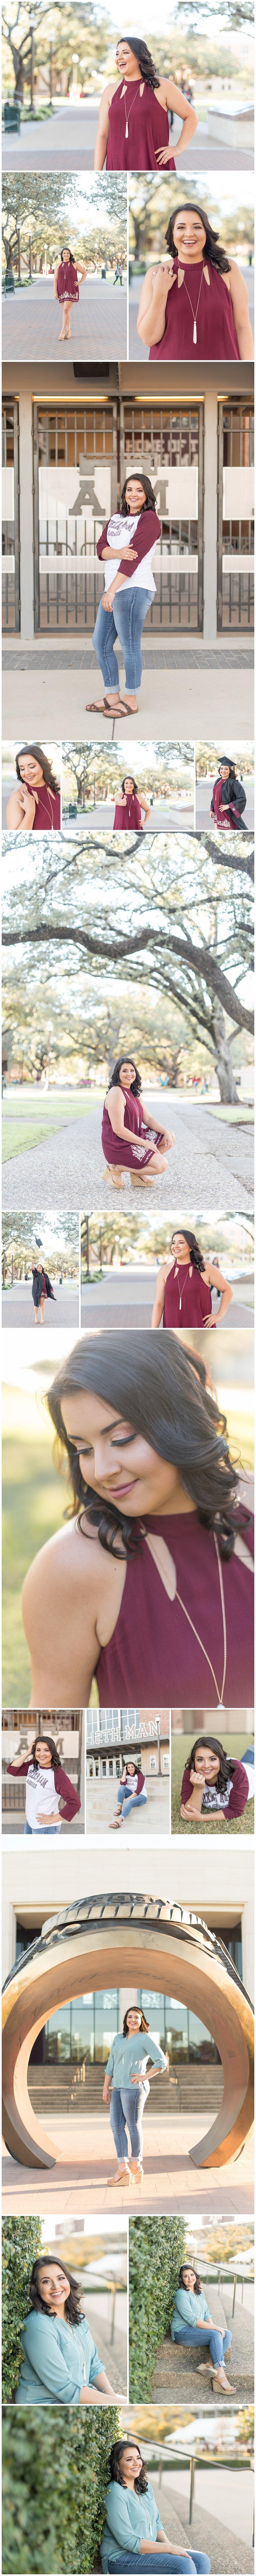 Texas A&M University Senior Session | College Station, TX | Katelyn Todd Photography